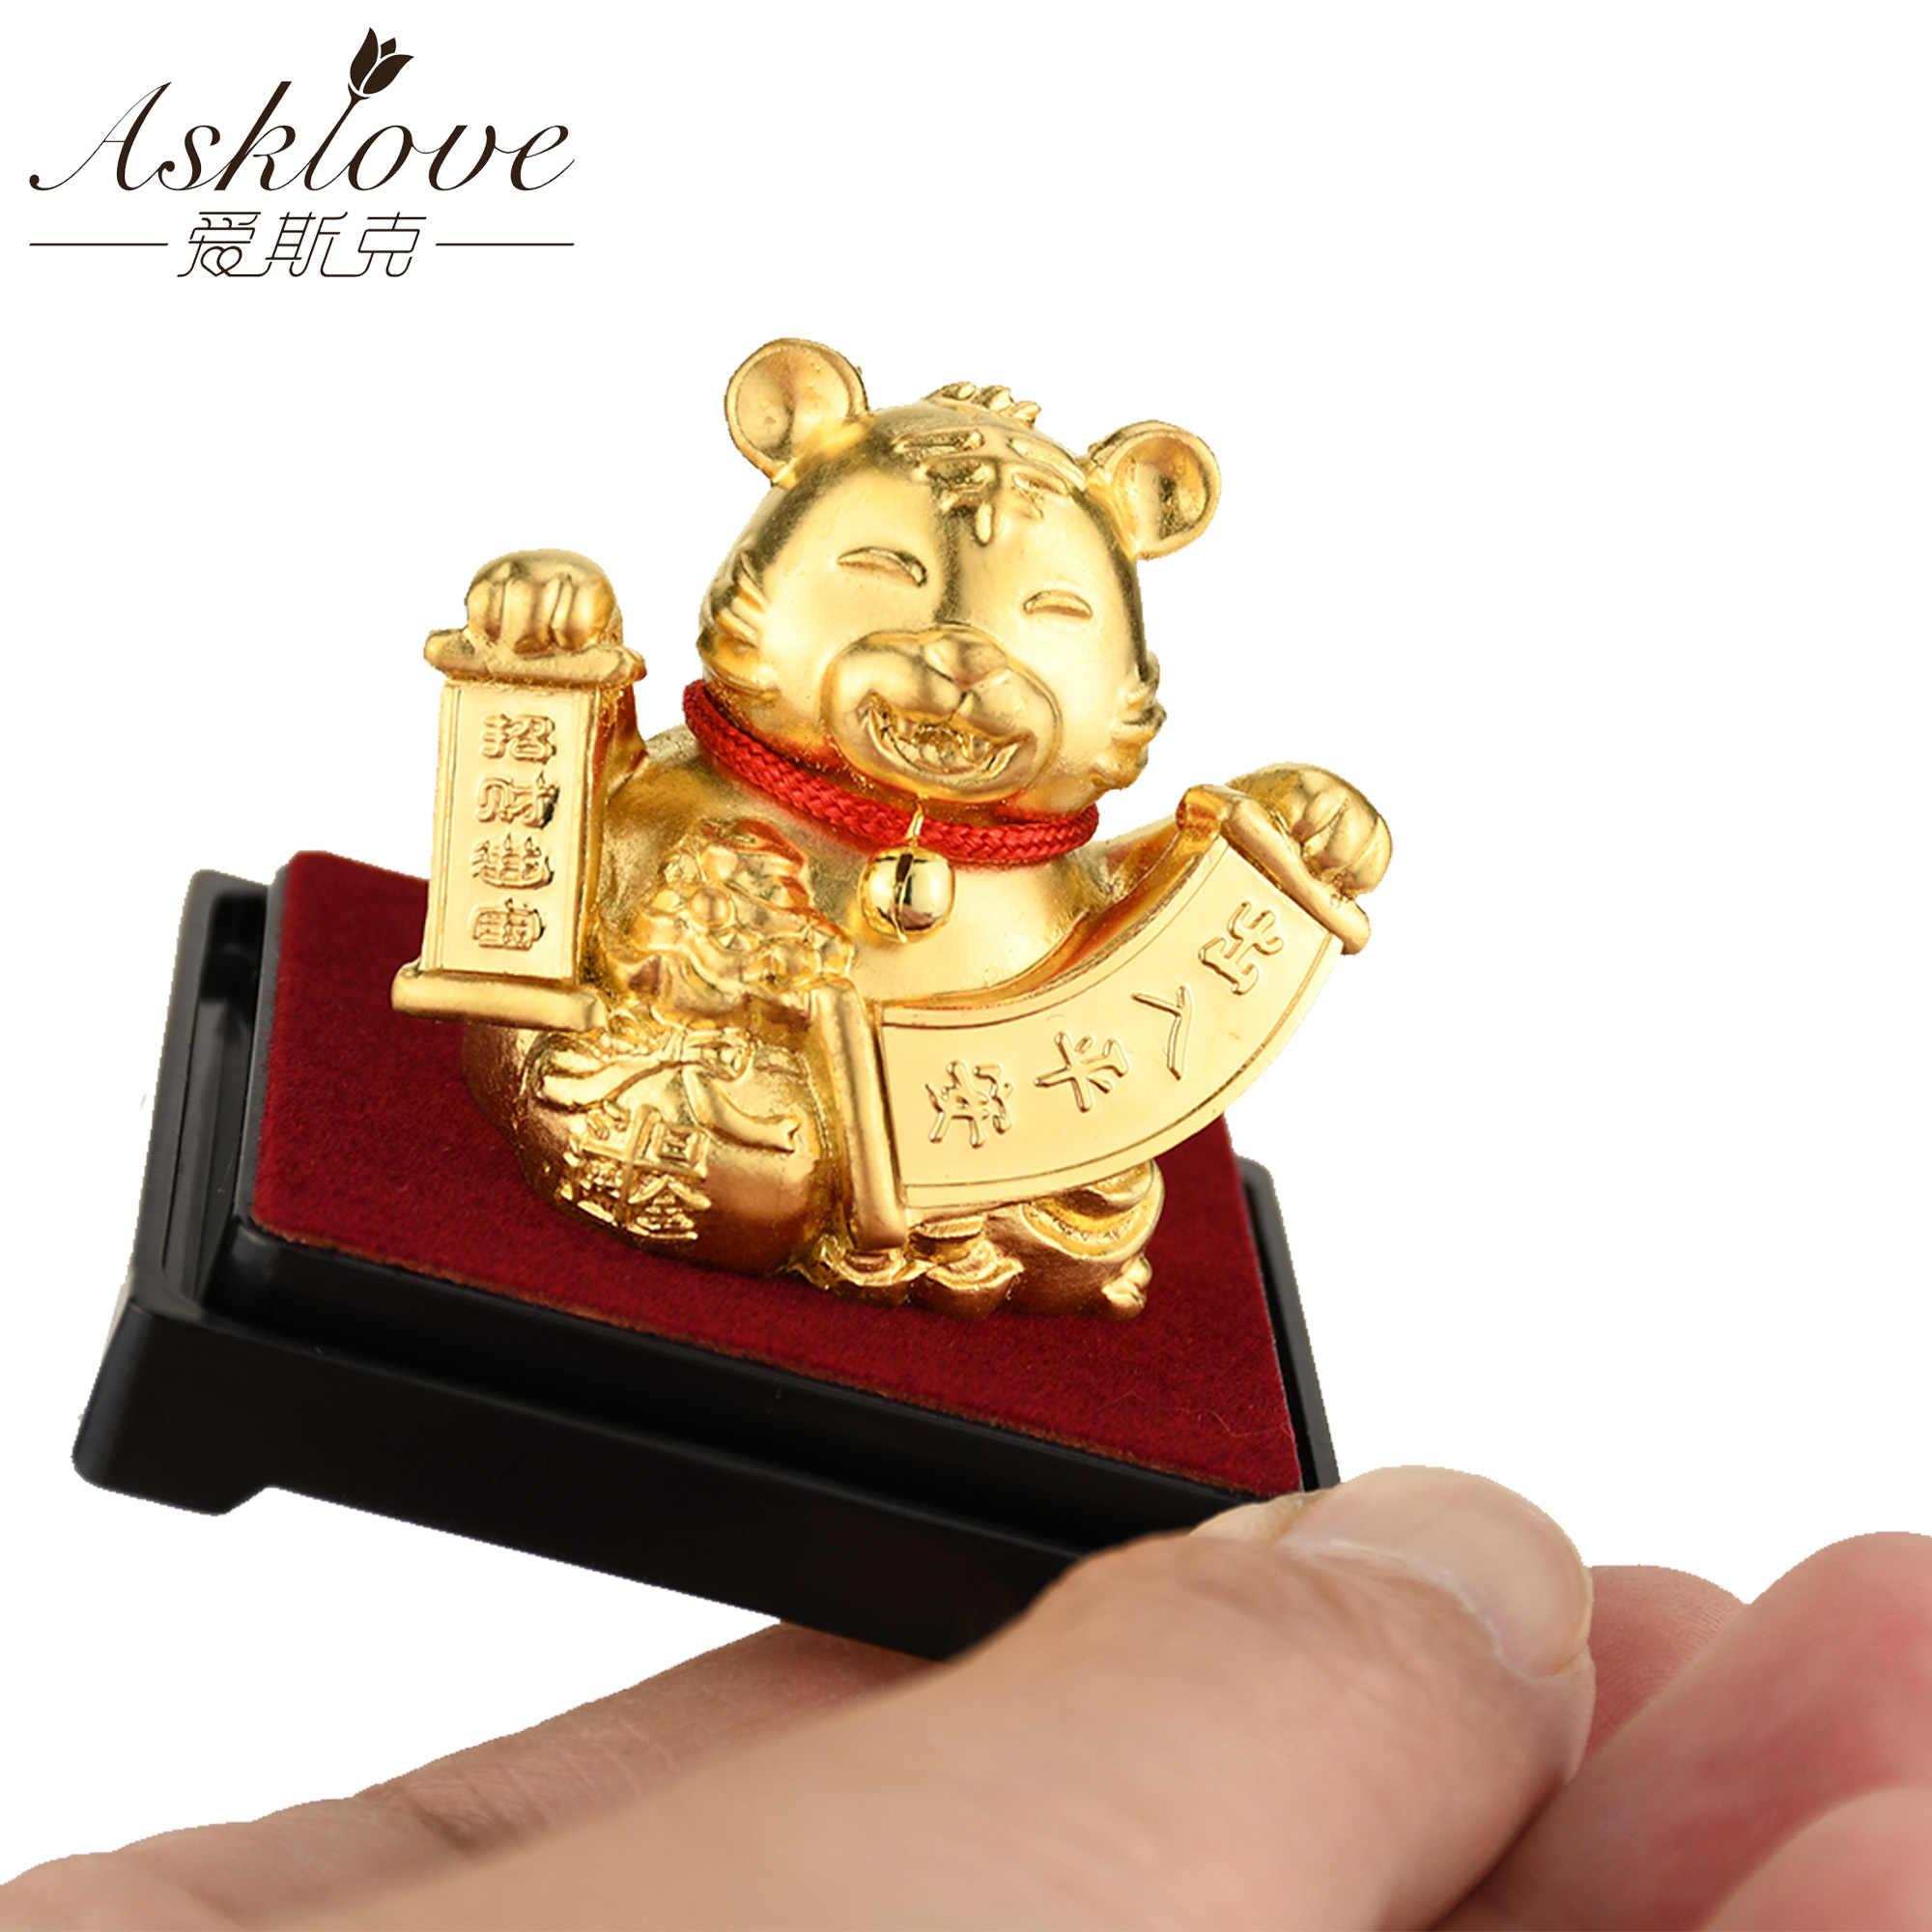 Chinese Zodiac Verzamelen Rijkdom Ornamenten 24 K Goud Folie Fengshui Decor Dragon/Rat/Varken/Aap Auto Geluk ambachten Home Office Decor